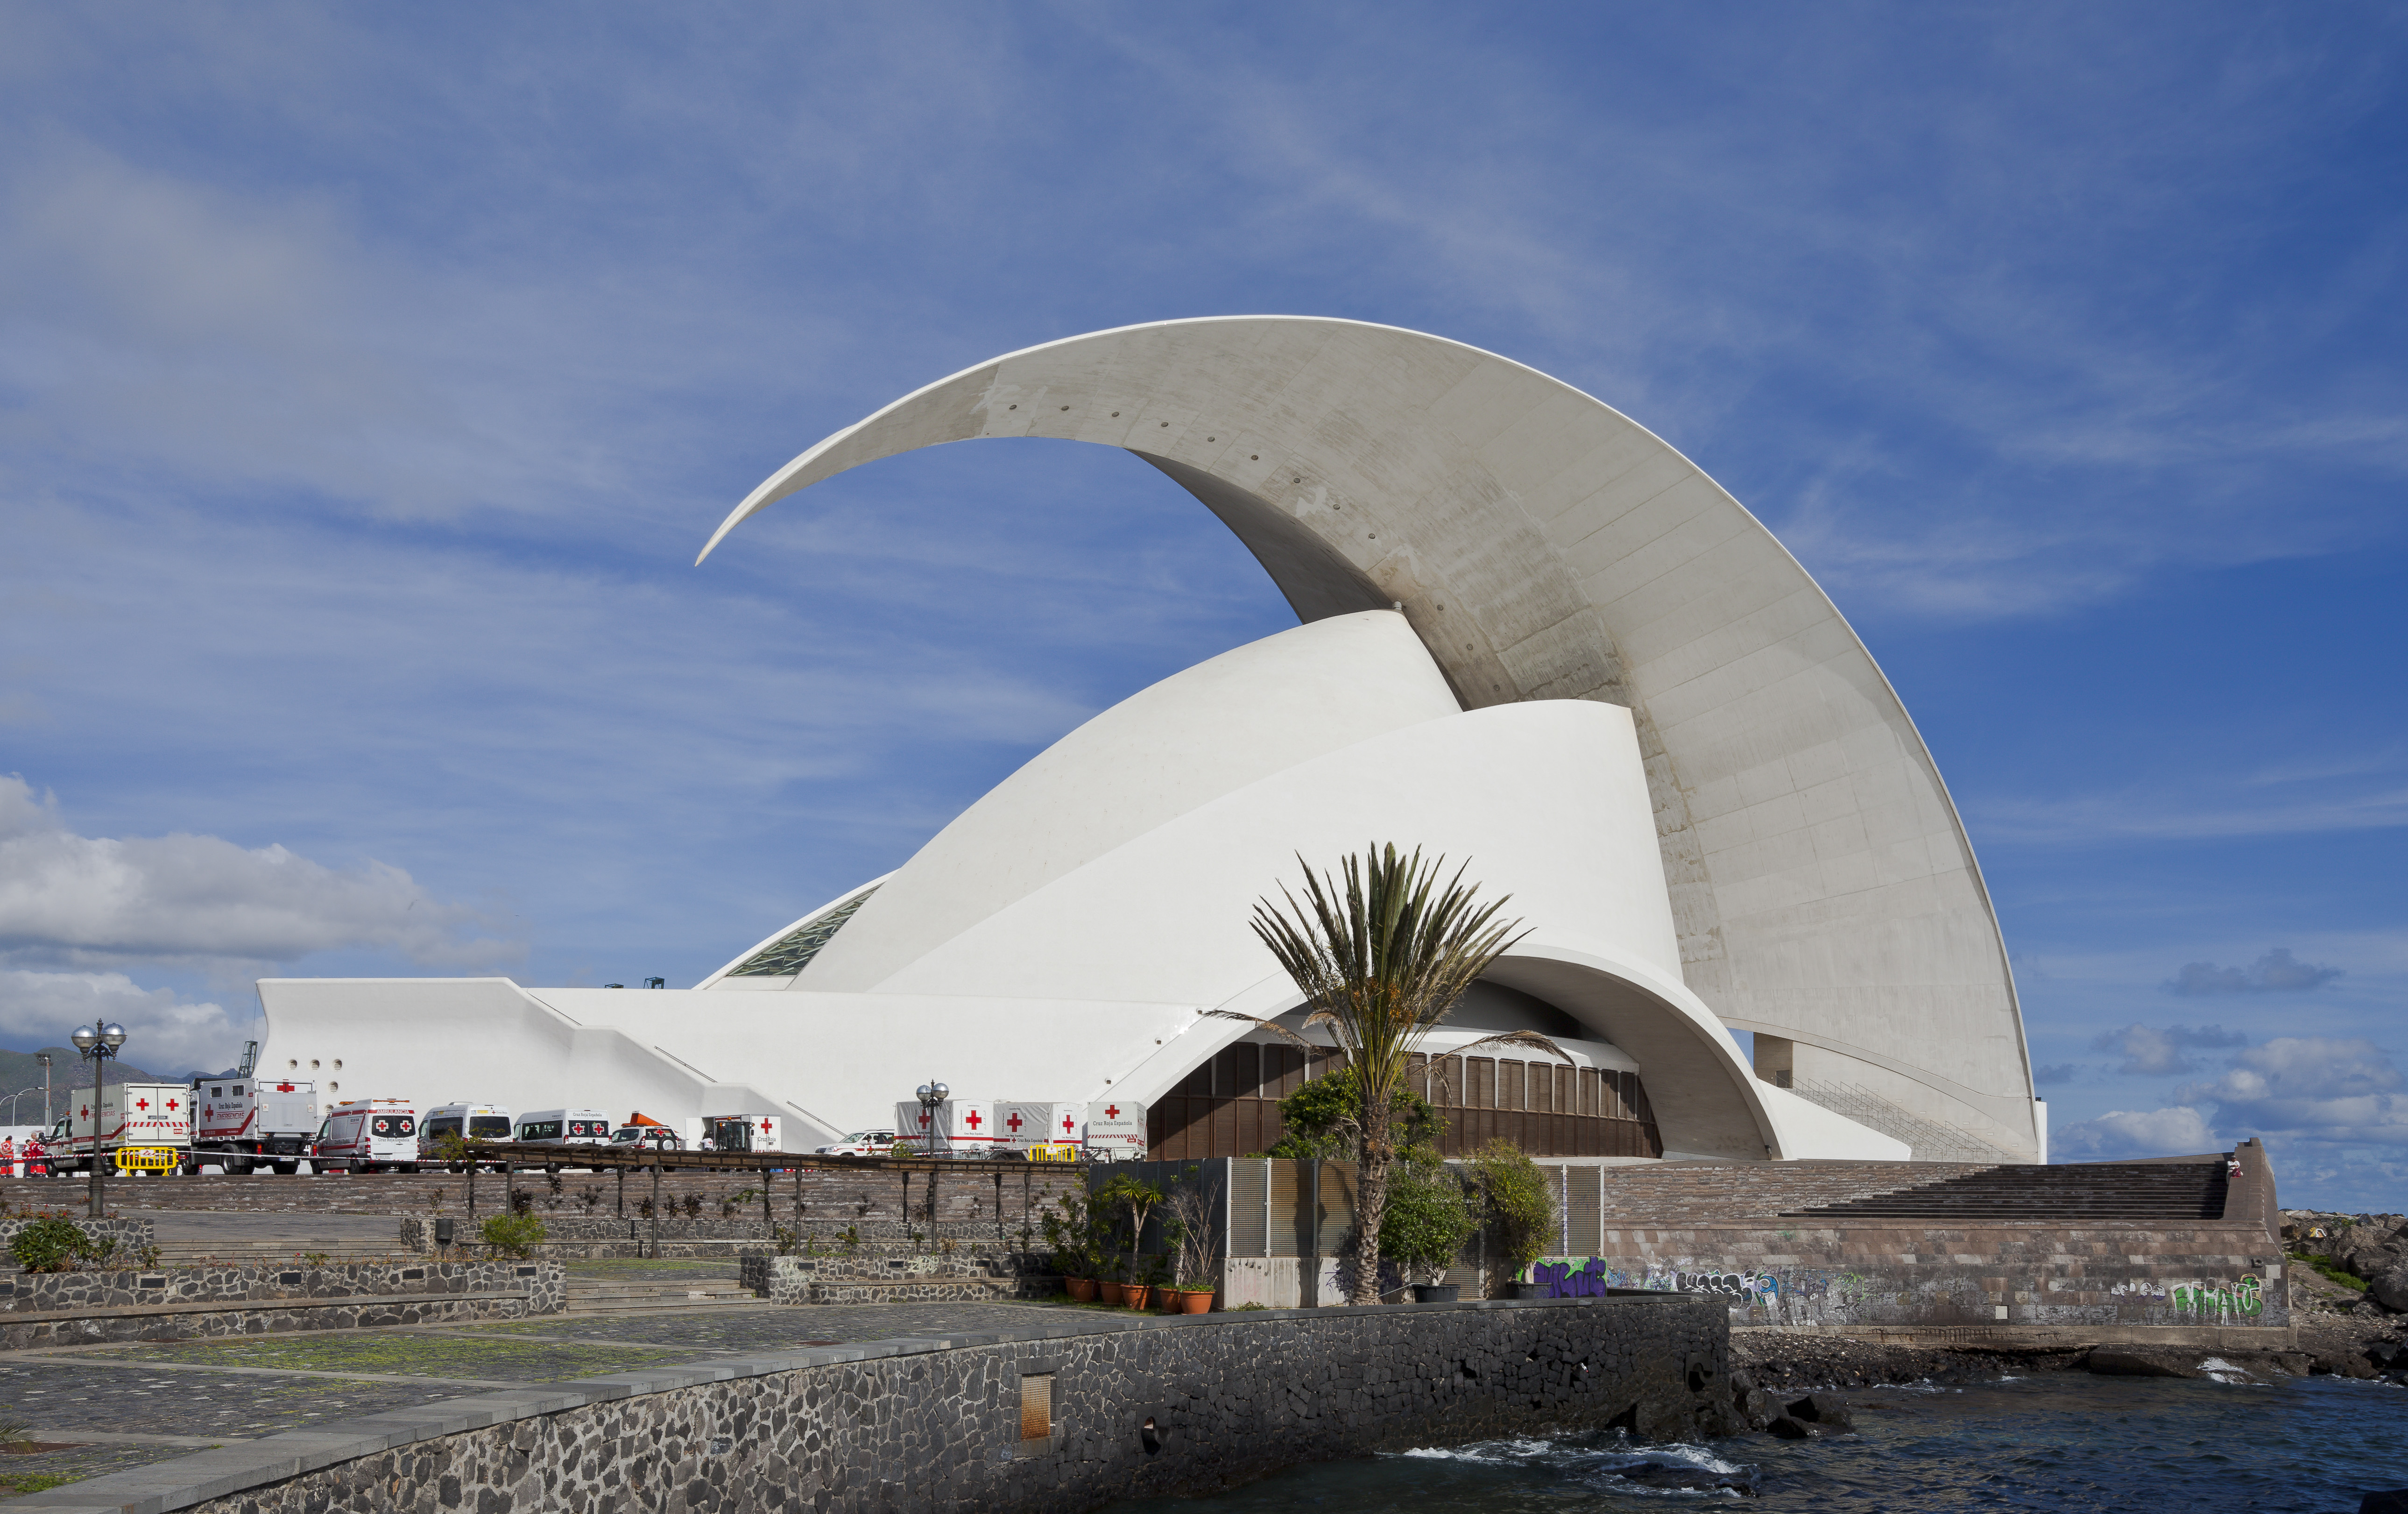 Fichier:Auditorio de Tenerife, Santa Cruz de Tenerife ...  Fichier:Auditor...